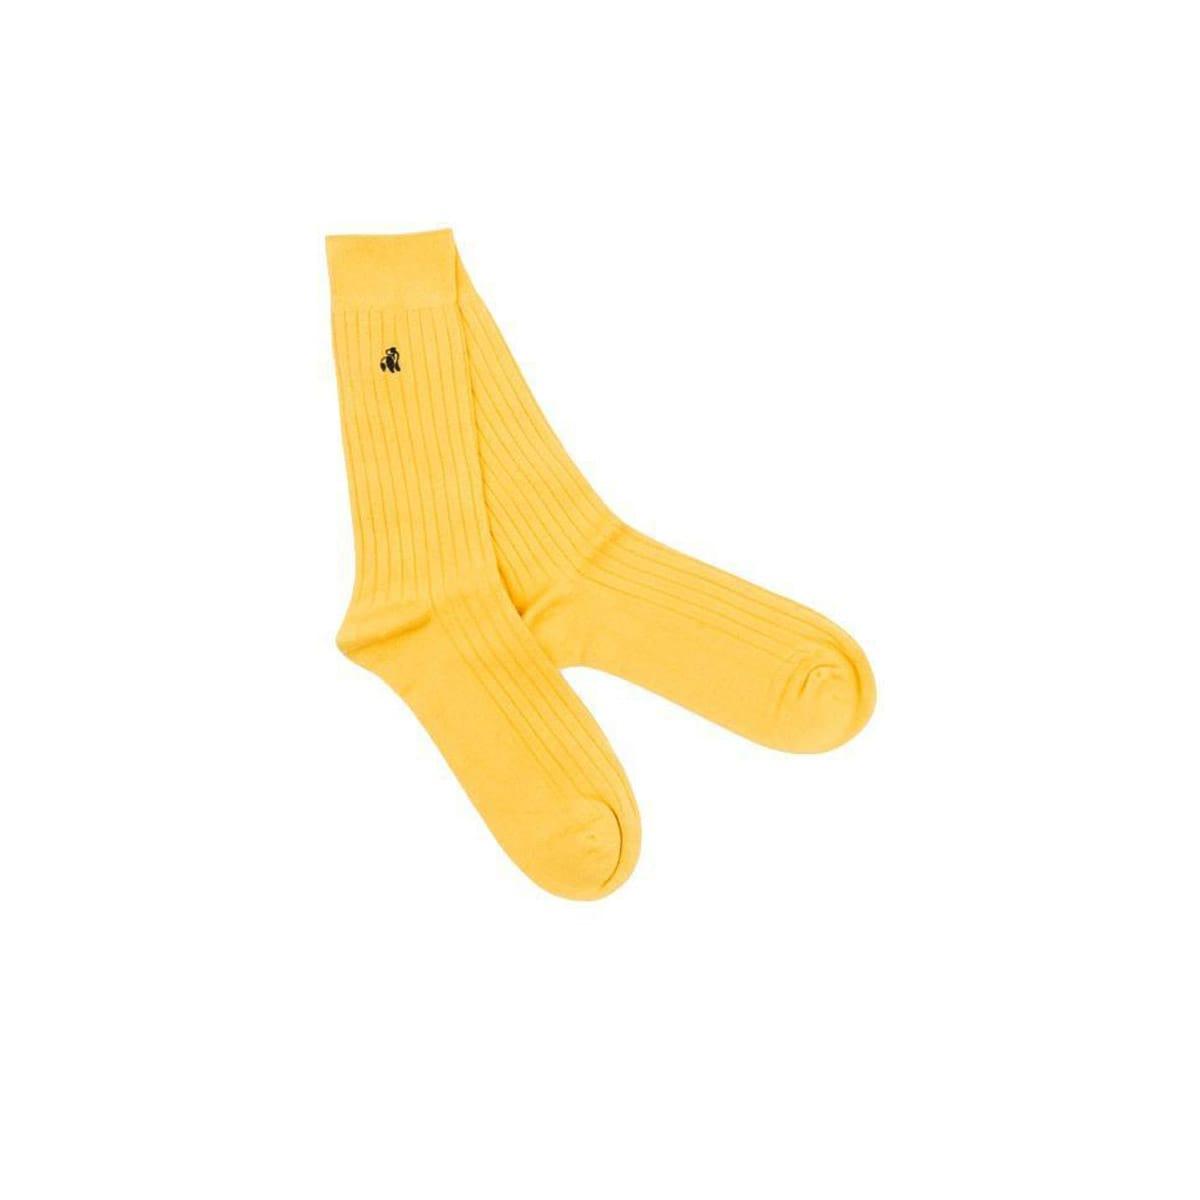 Bubblebee Yellow Socks by Swole Panda | Restoration Yard